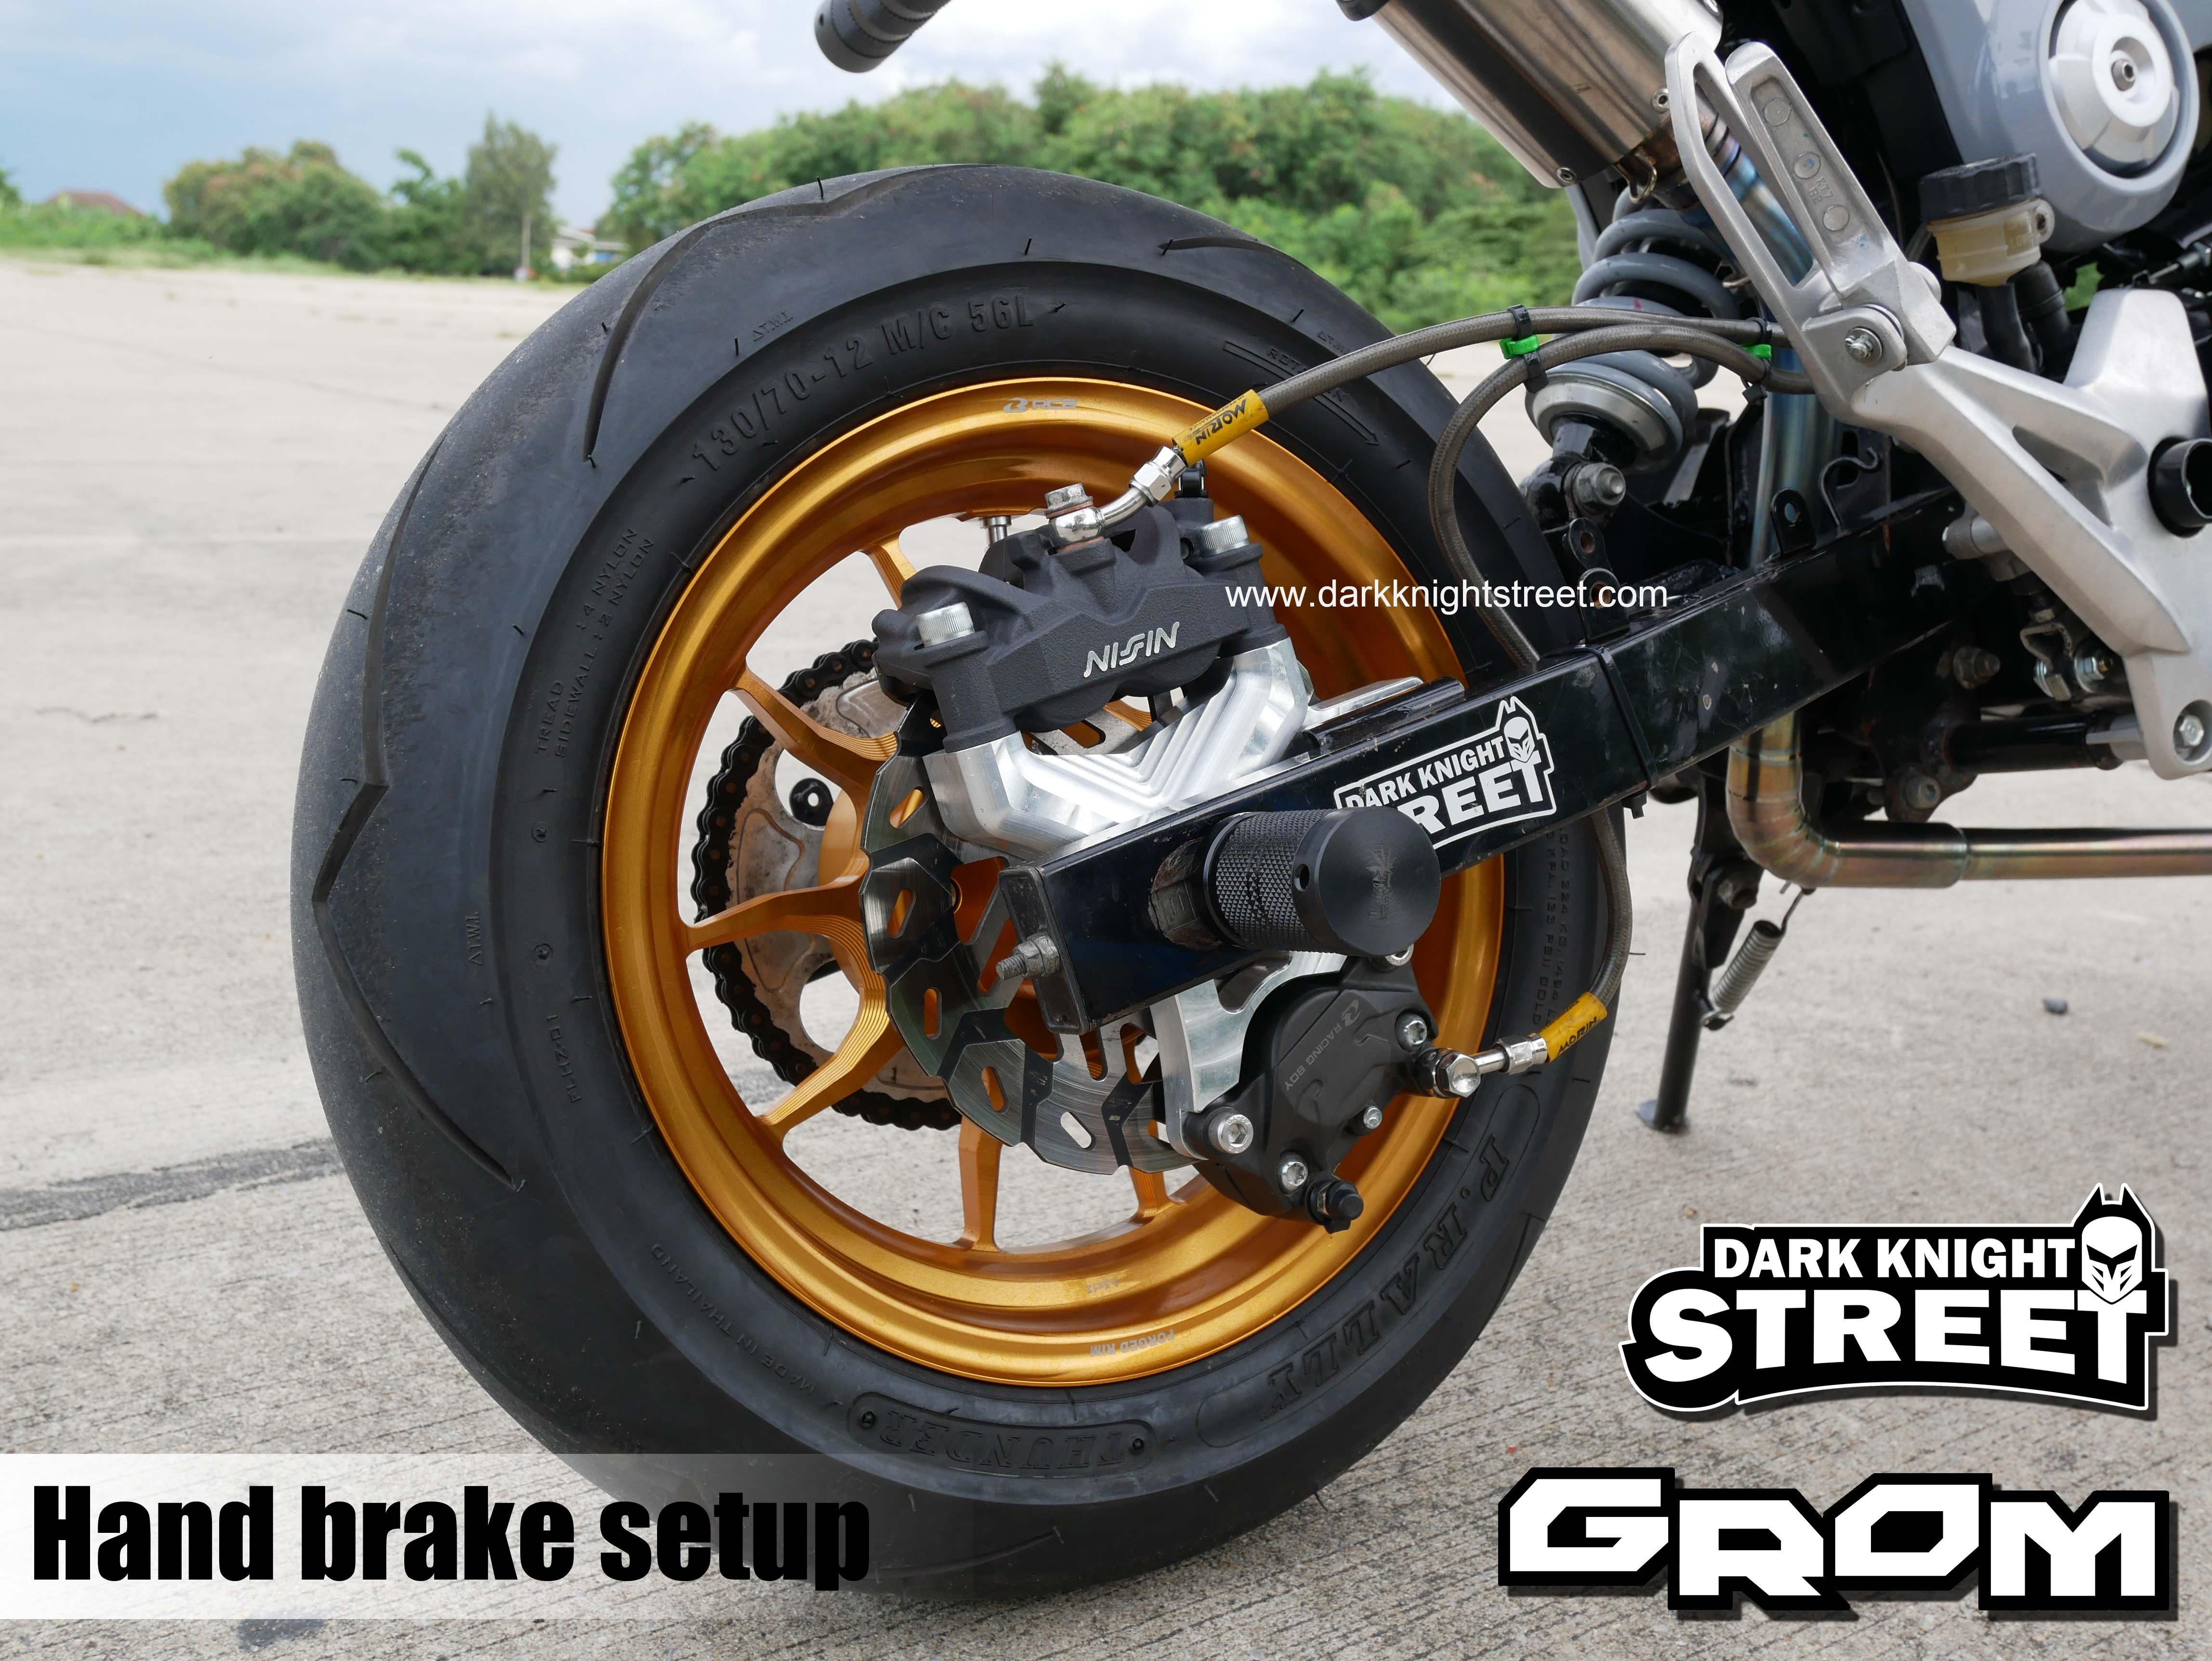 NEW!!! Hand brake setup